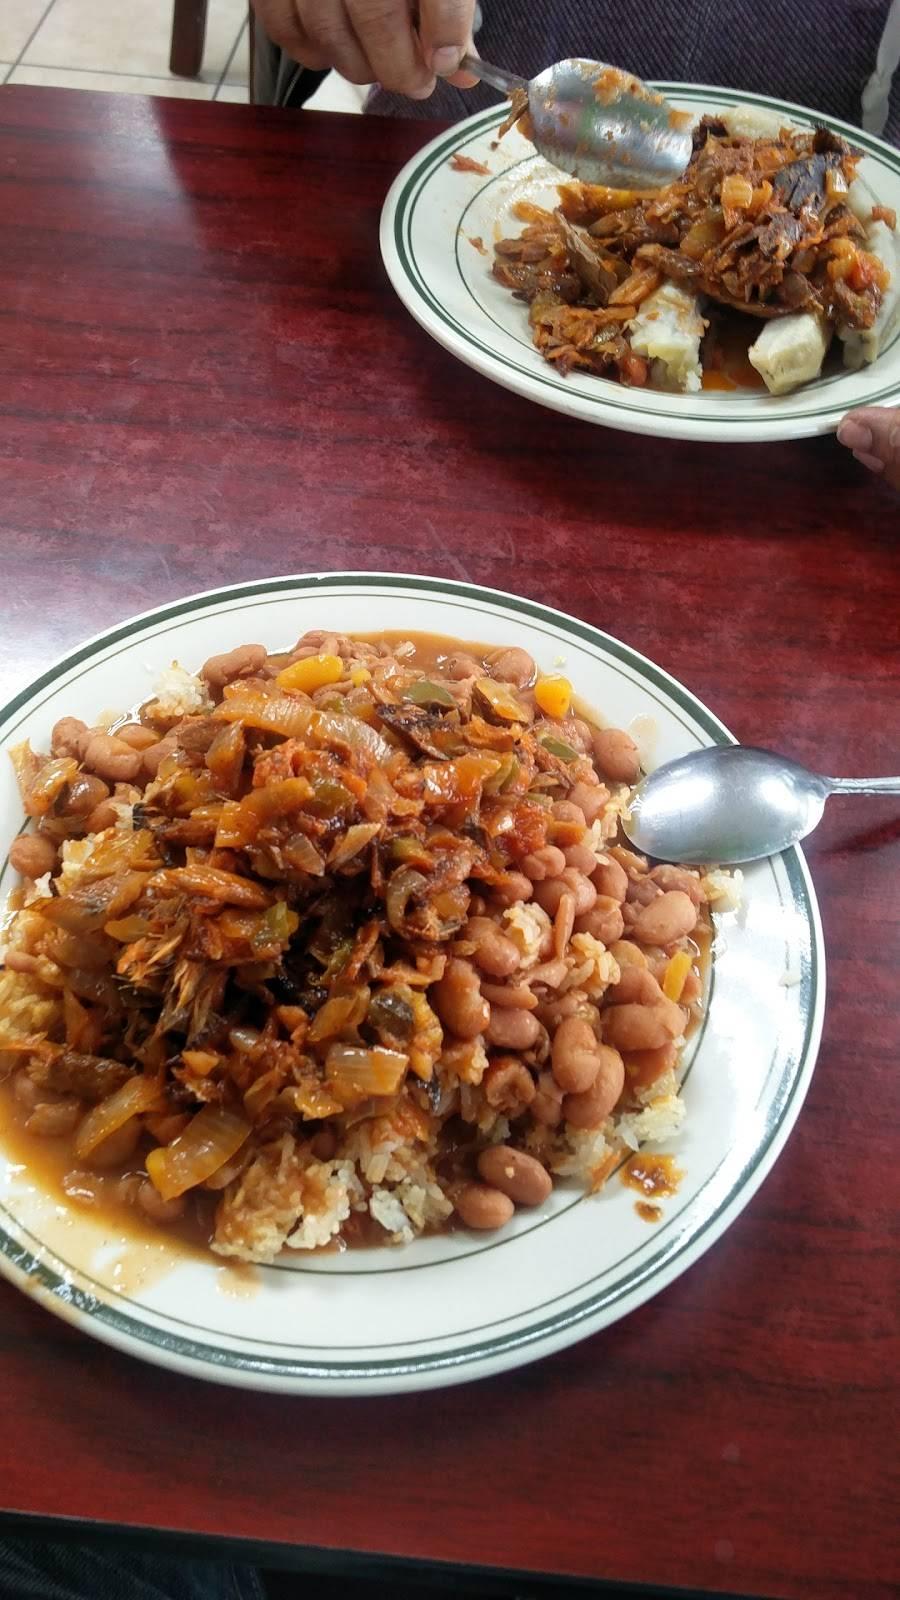 La Morena | restaurant | 1151 Tiffany St, Bronx, NY 10459, USA | 7188936079 OR +1 718-893-6079